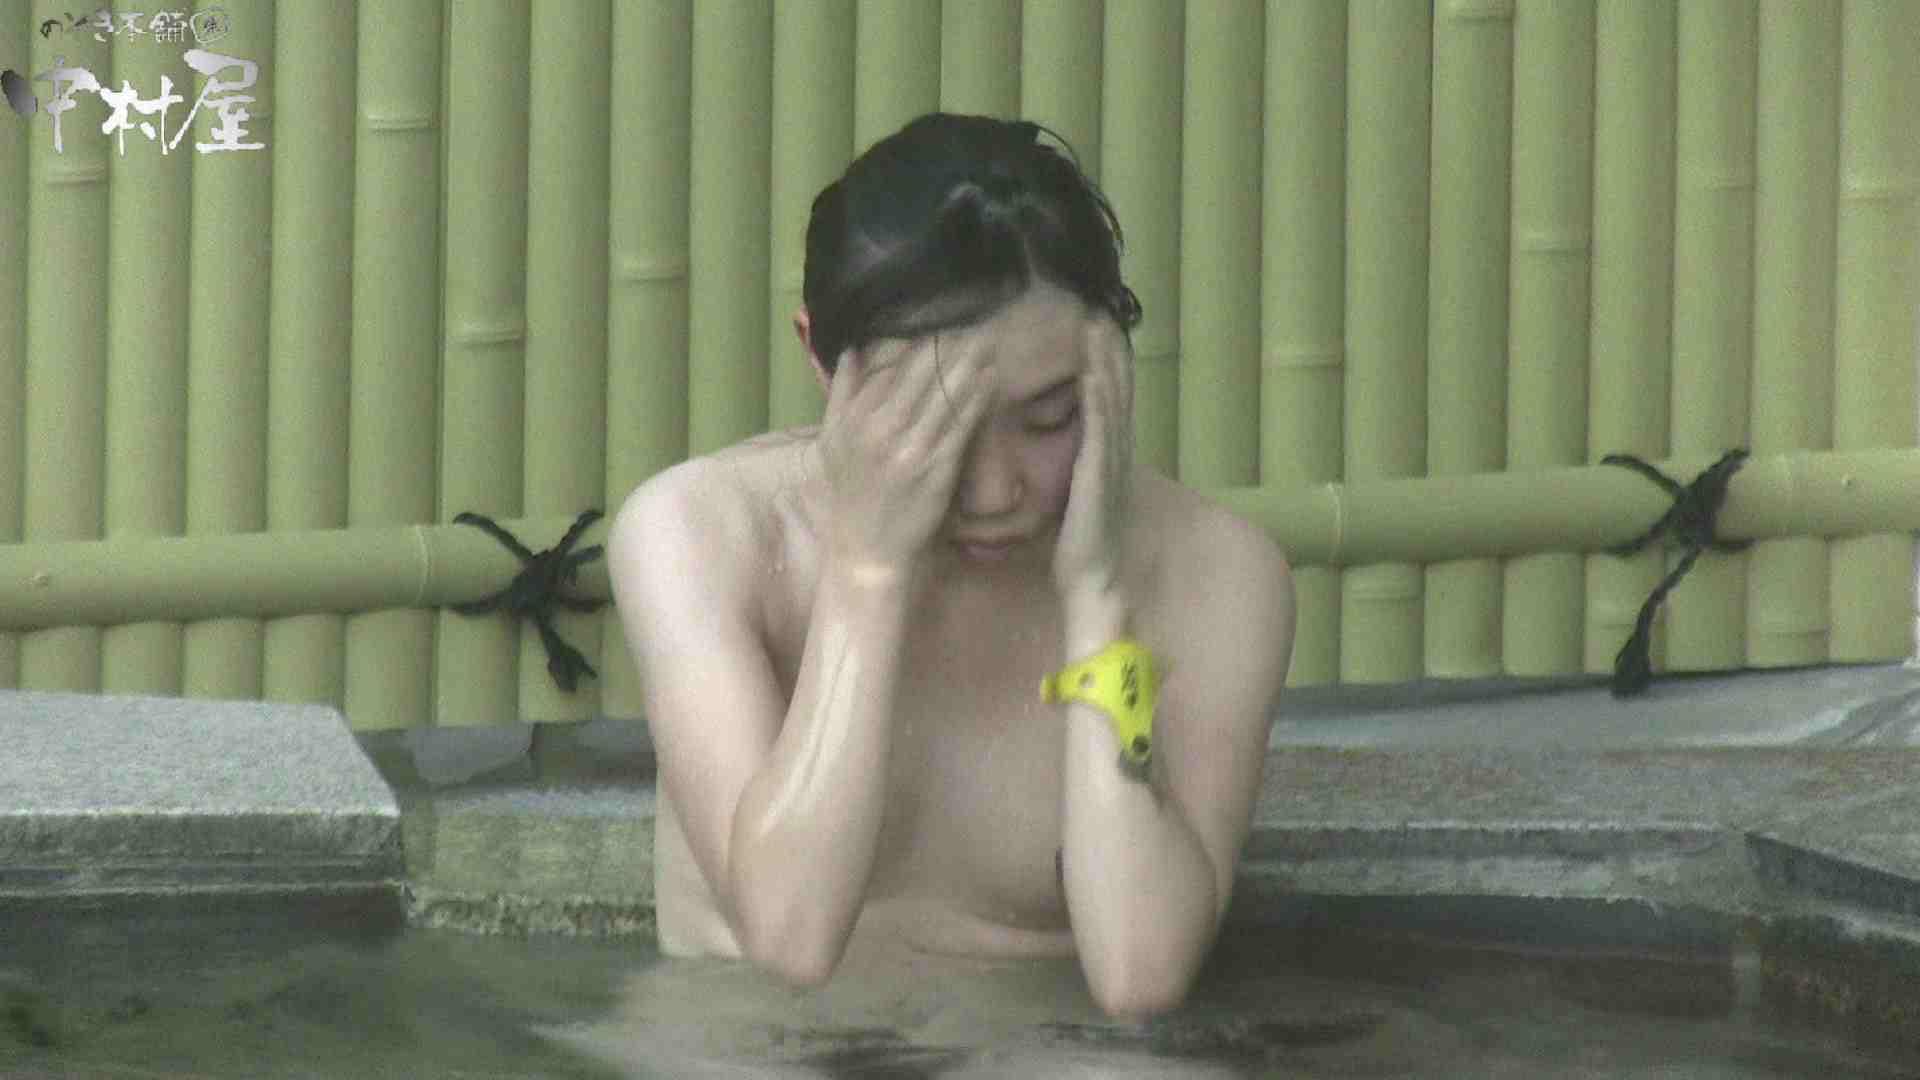 Aquaな露天風呂Vol.910 盗撮シリーズ | 露天風呂編  84PIX 9